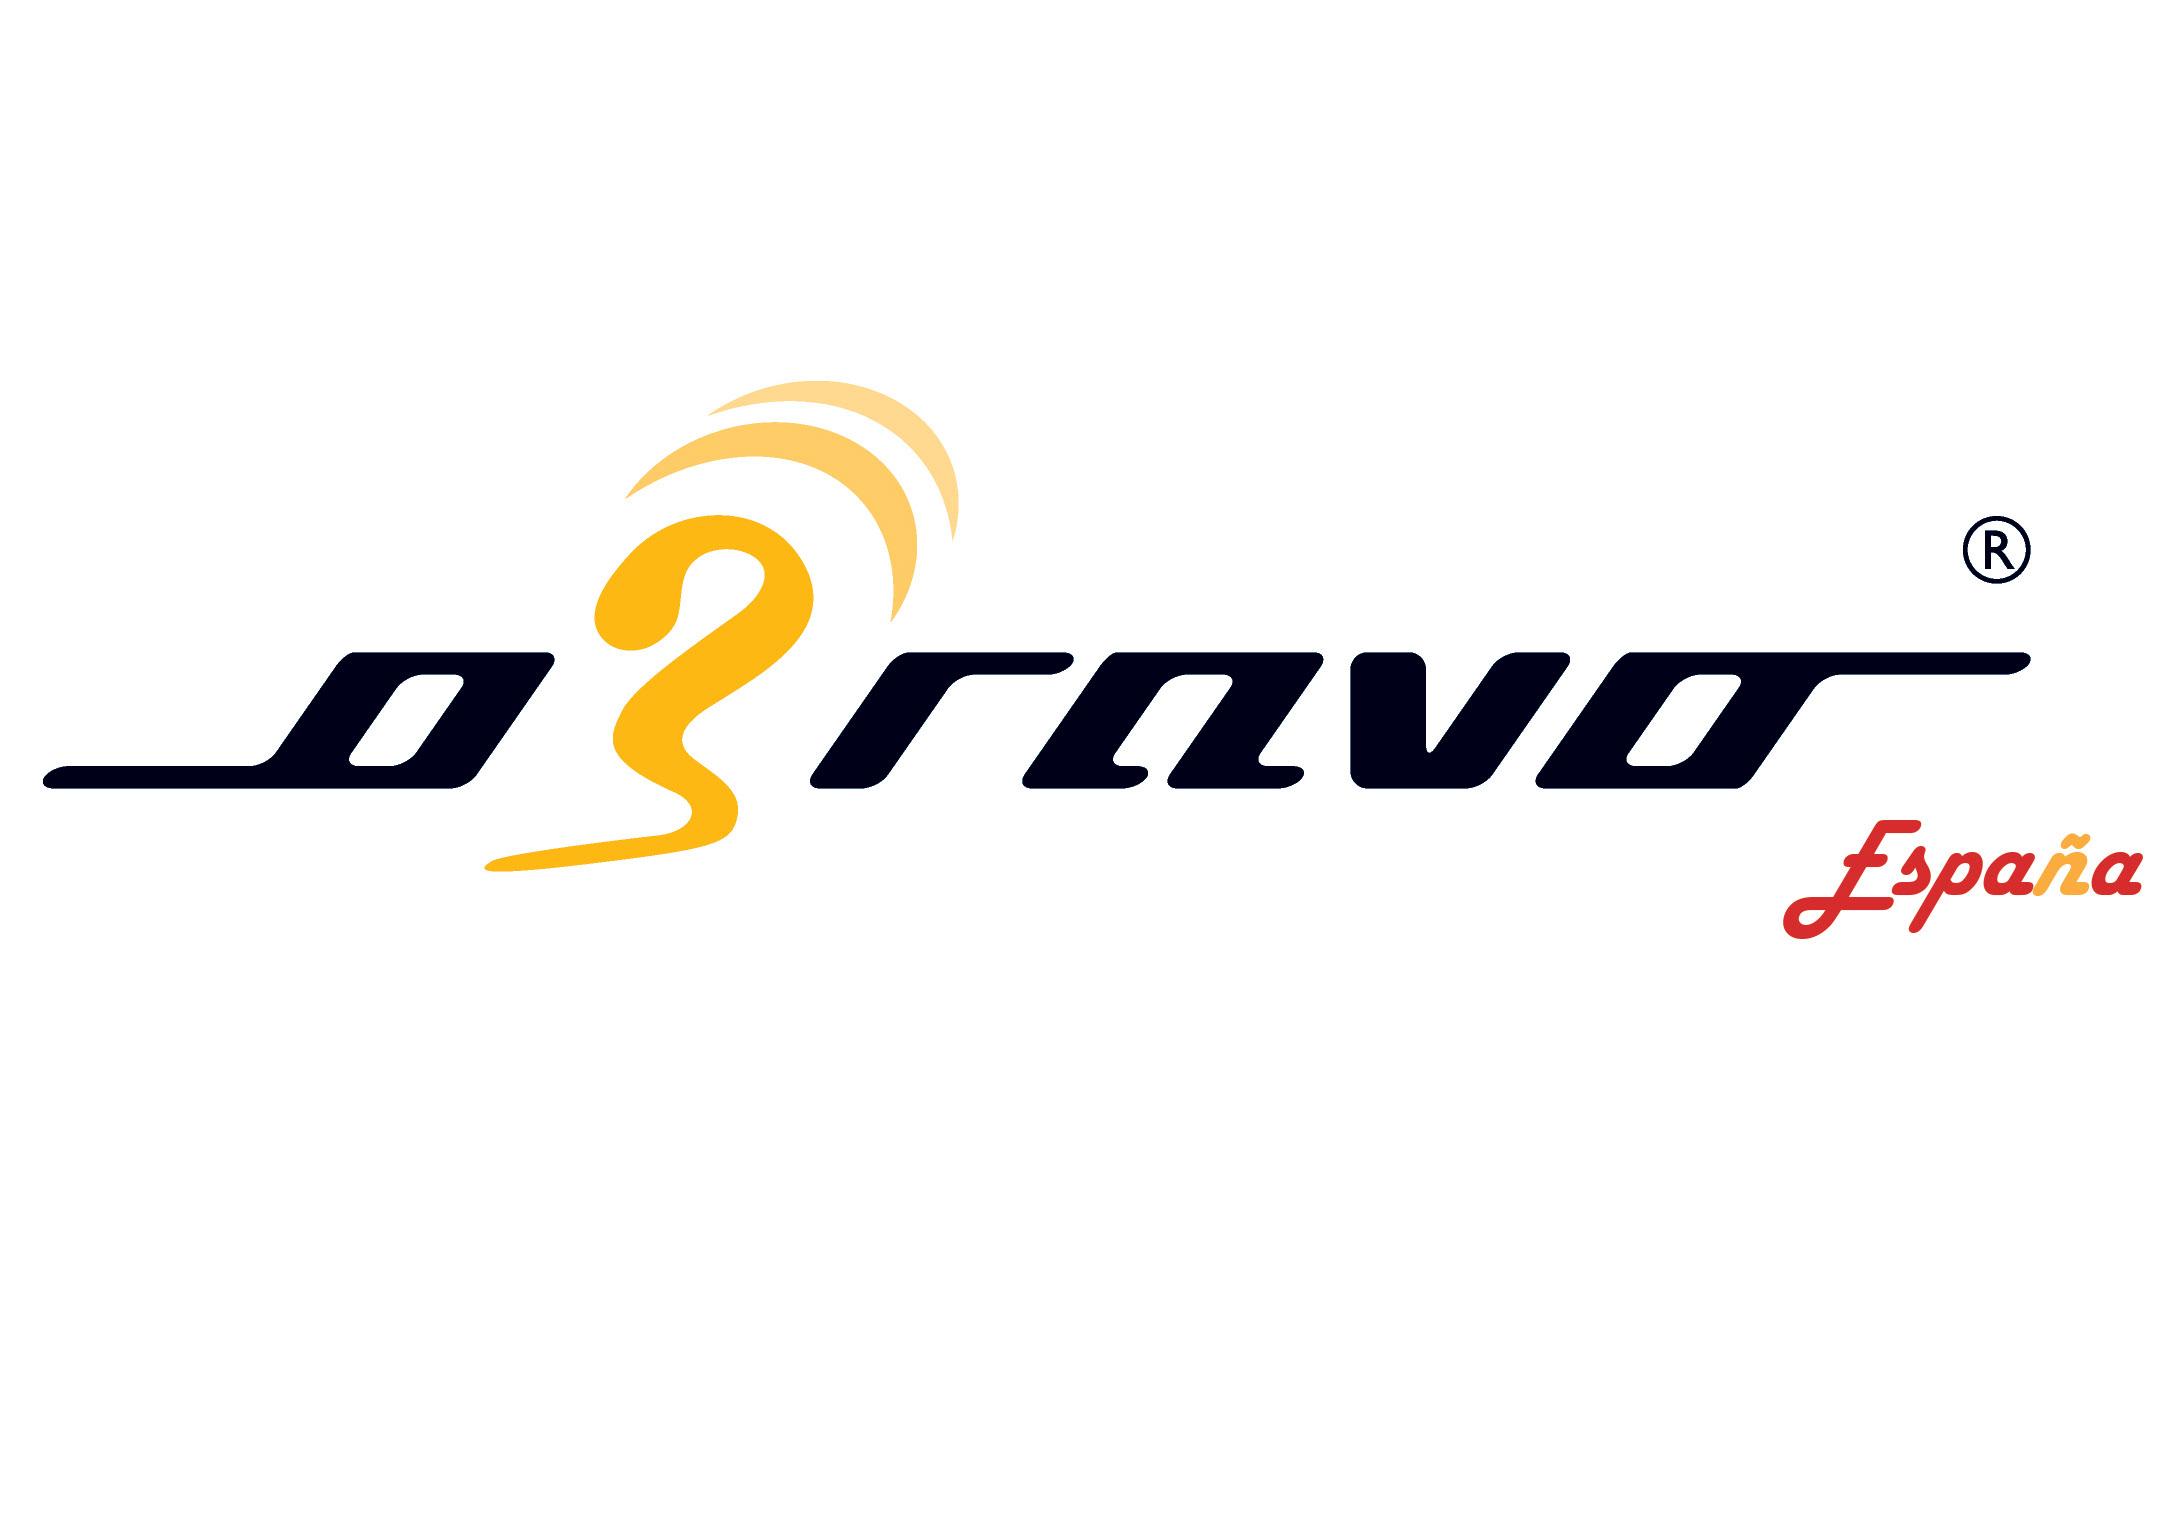 oBravo Audio España